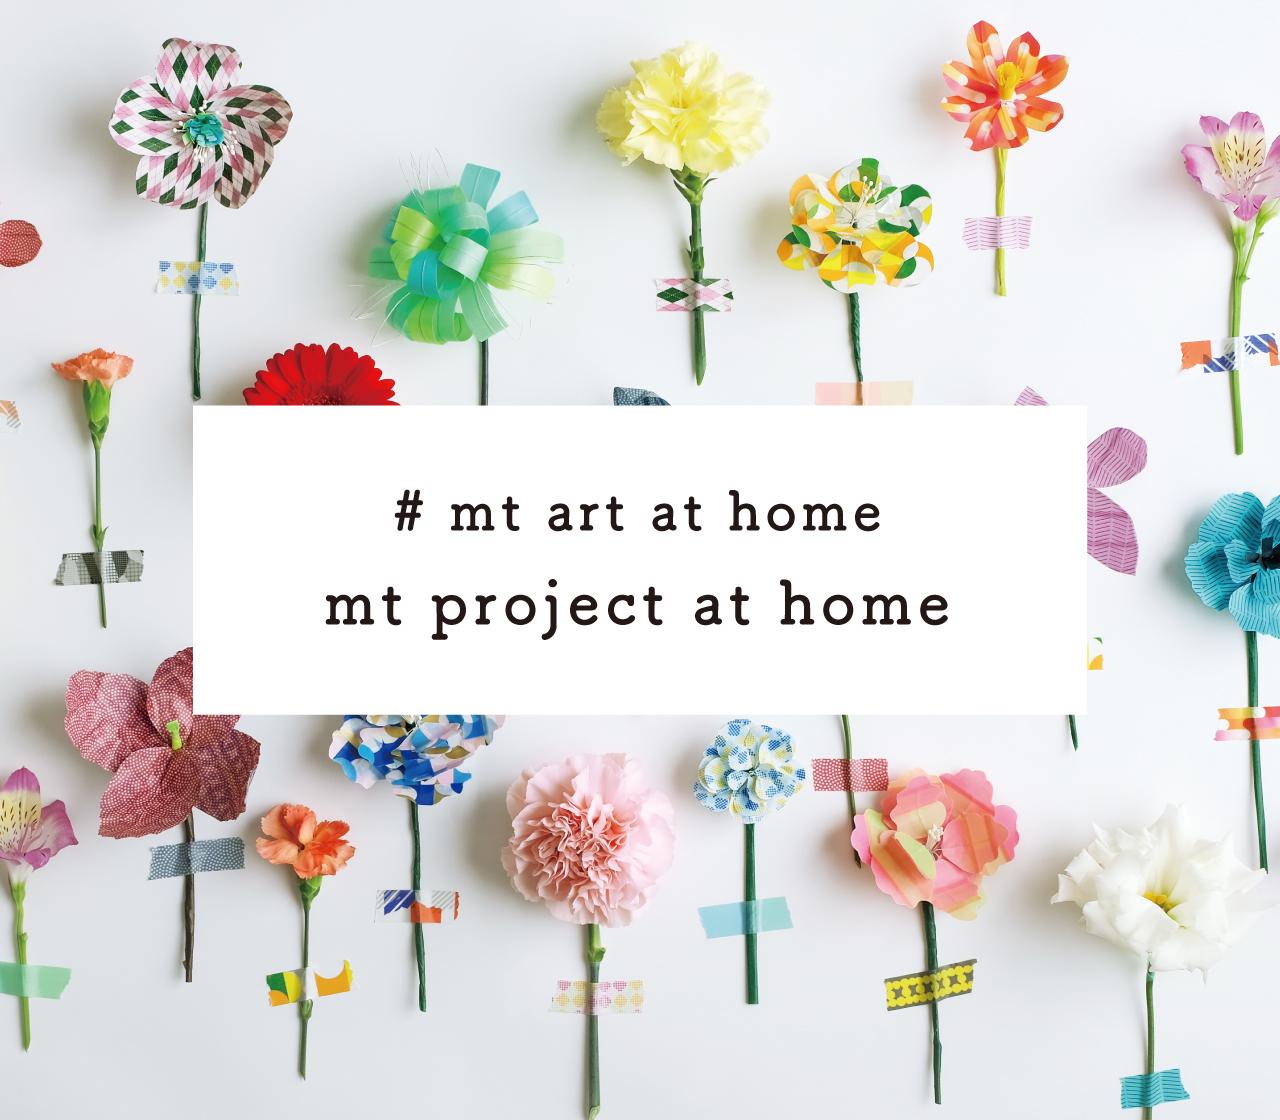 #mt art at home | 在家动手研究mt